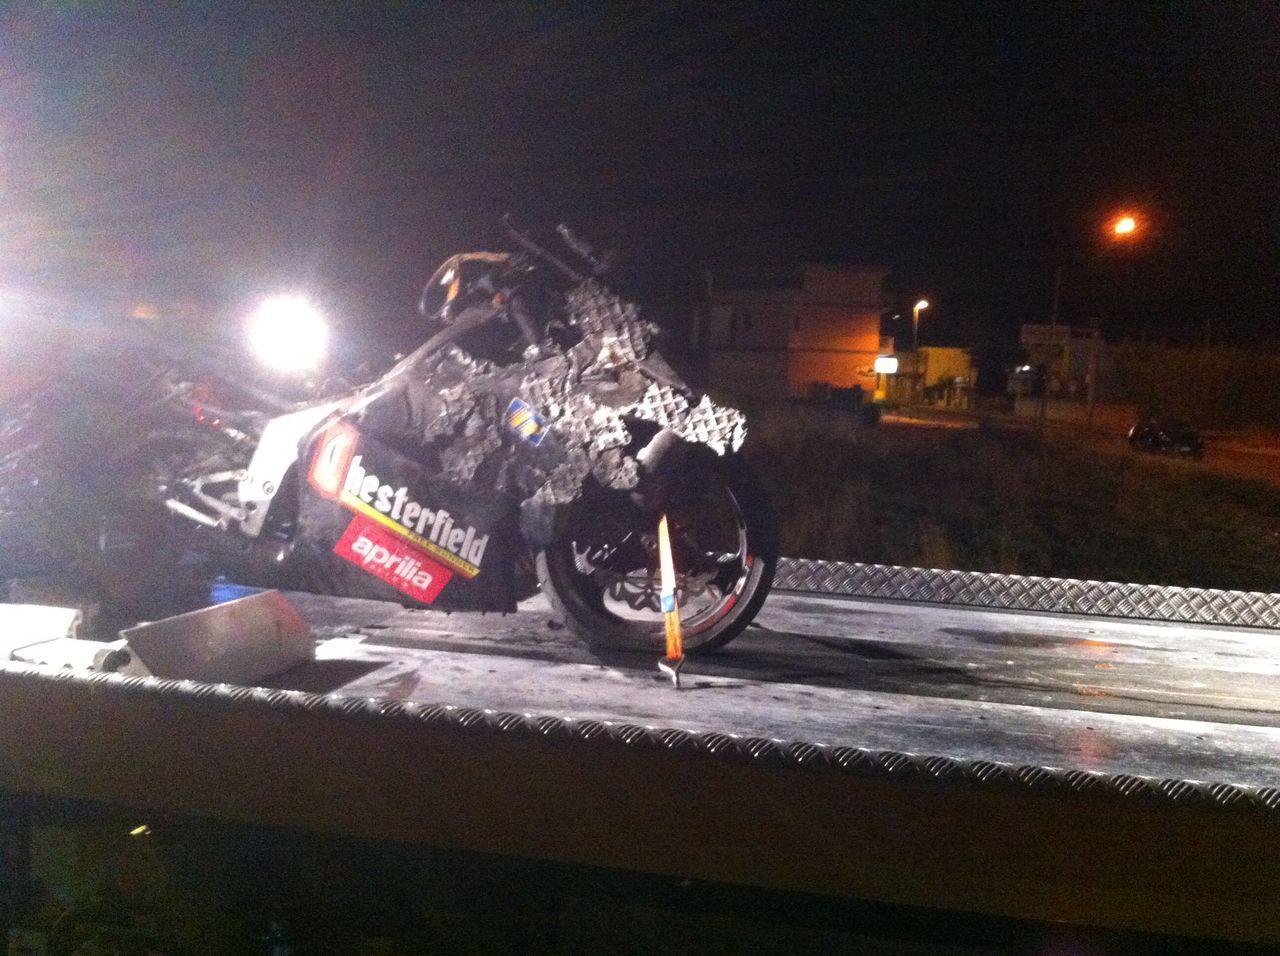 Incidente in moto: muore 18enne In evidenza